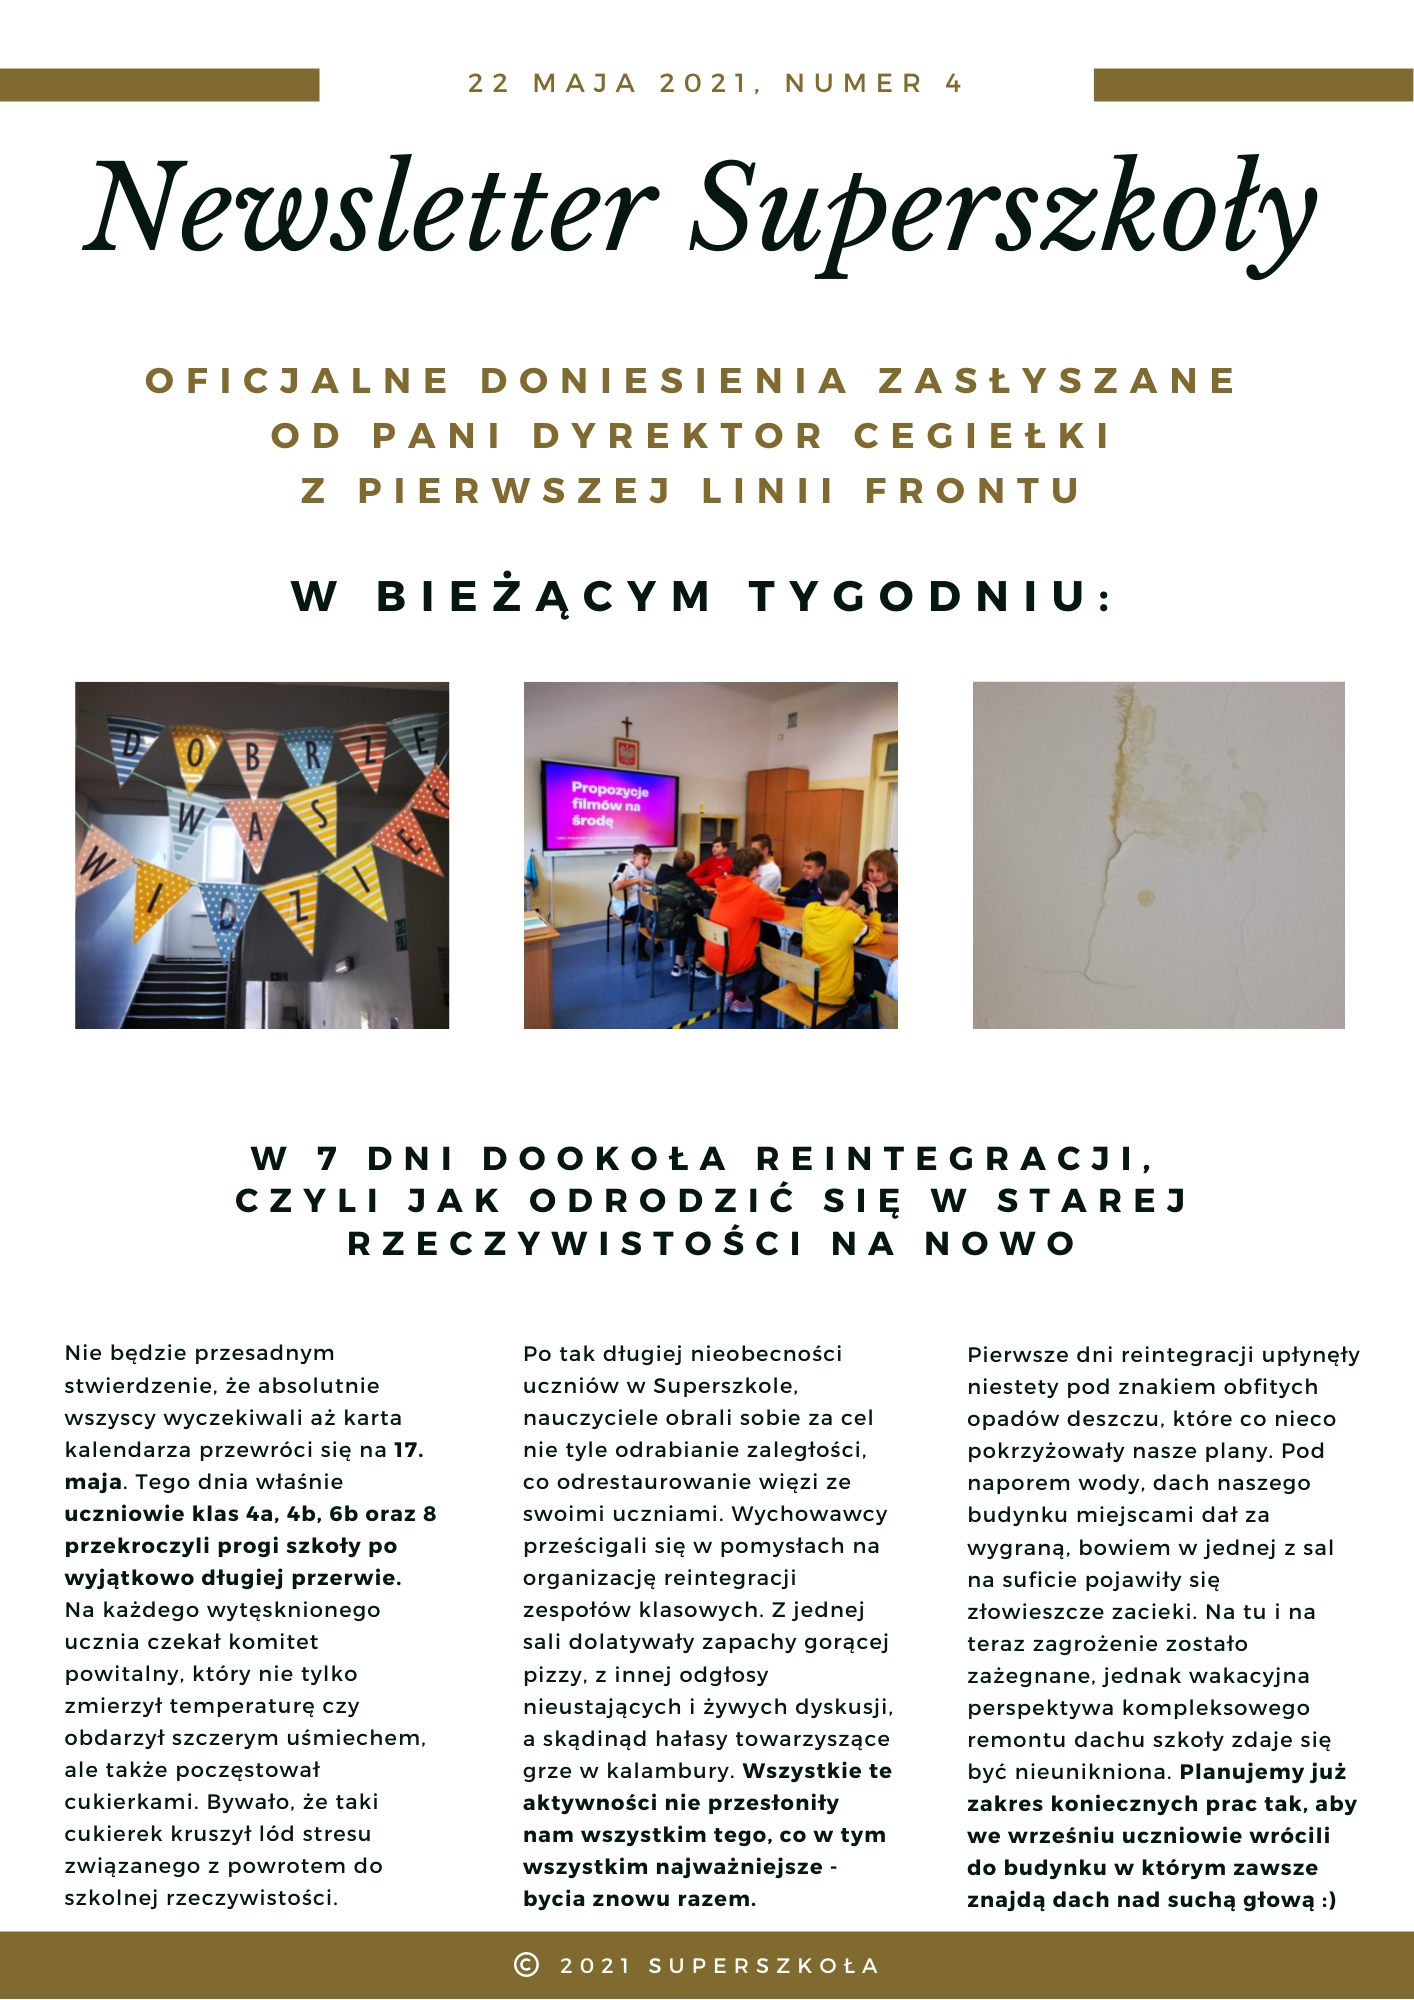 Newsletter_Superszkoły_4